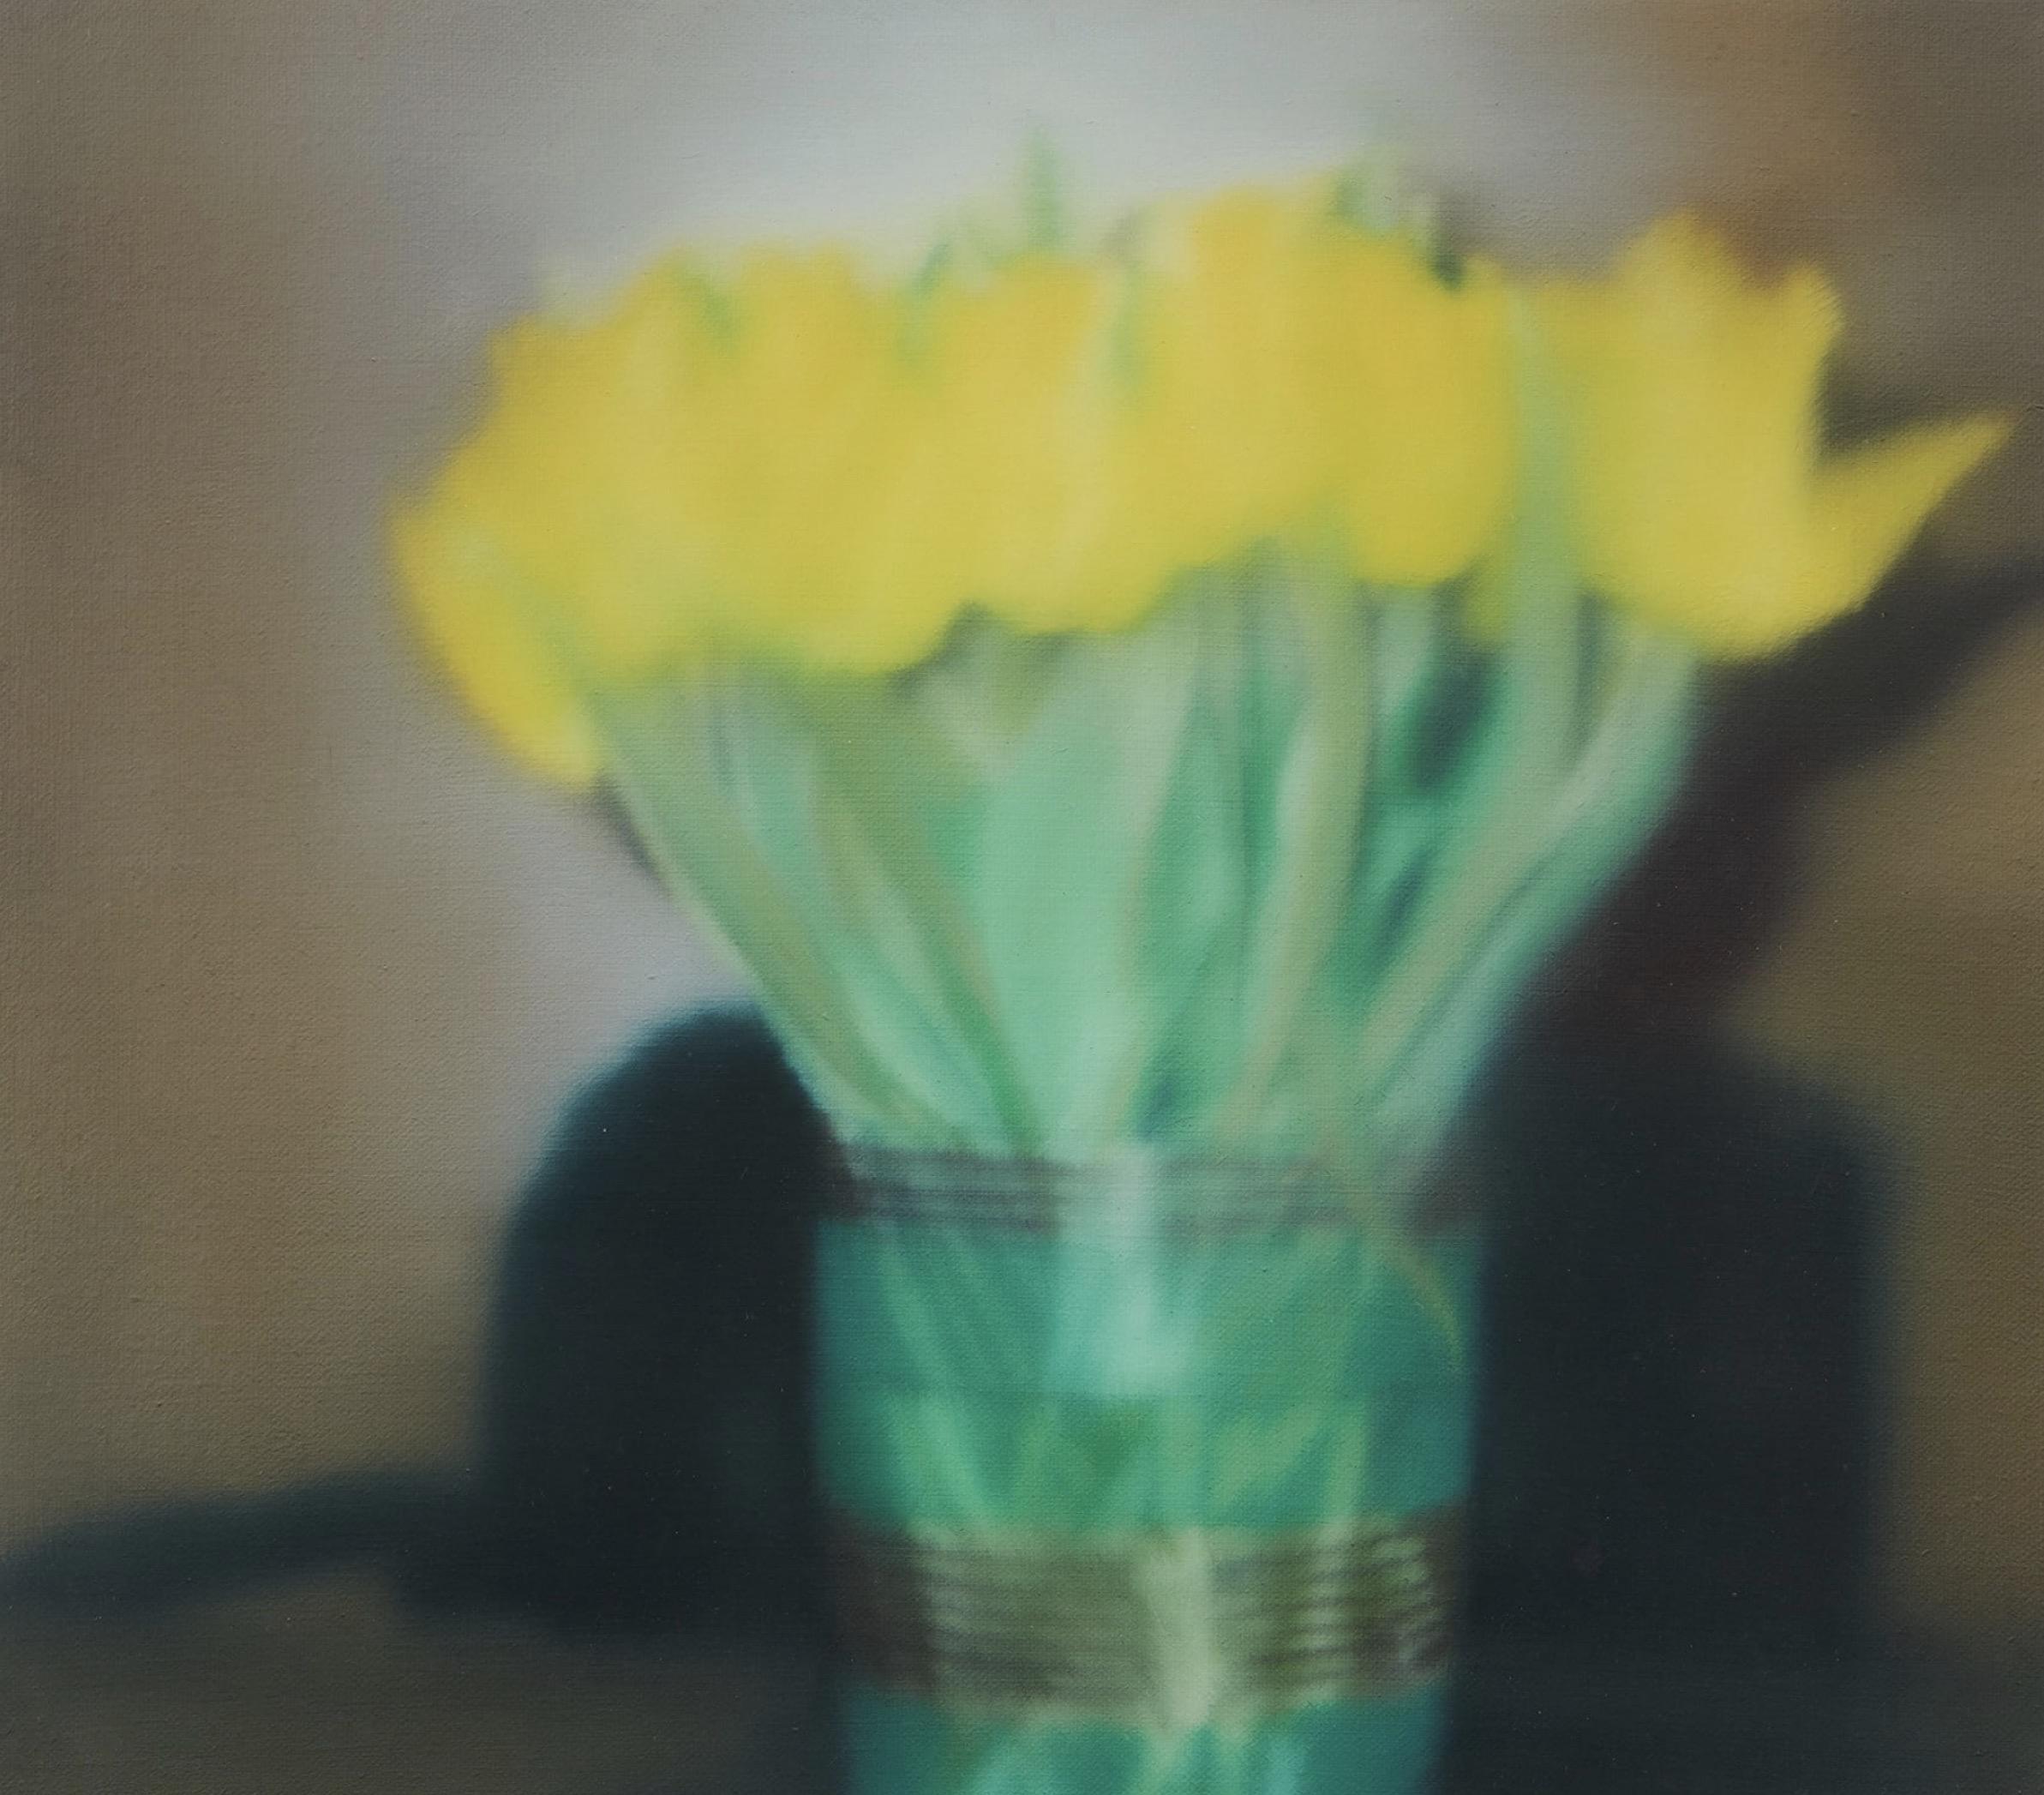 Tulips (P17) by Gerhard Richter